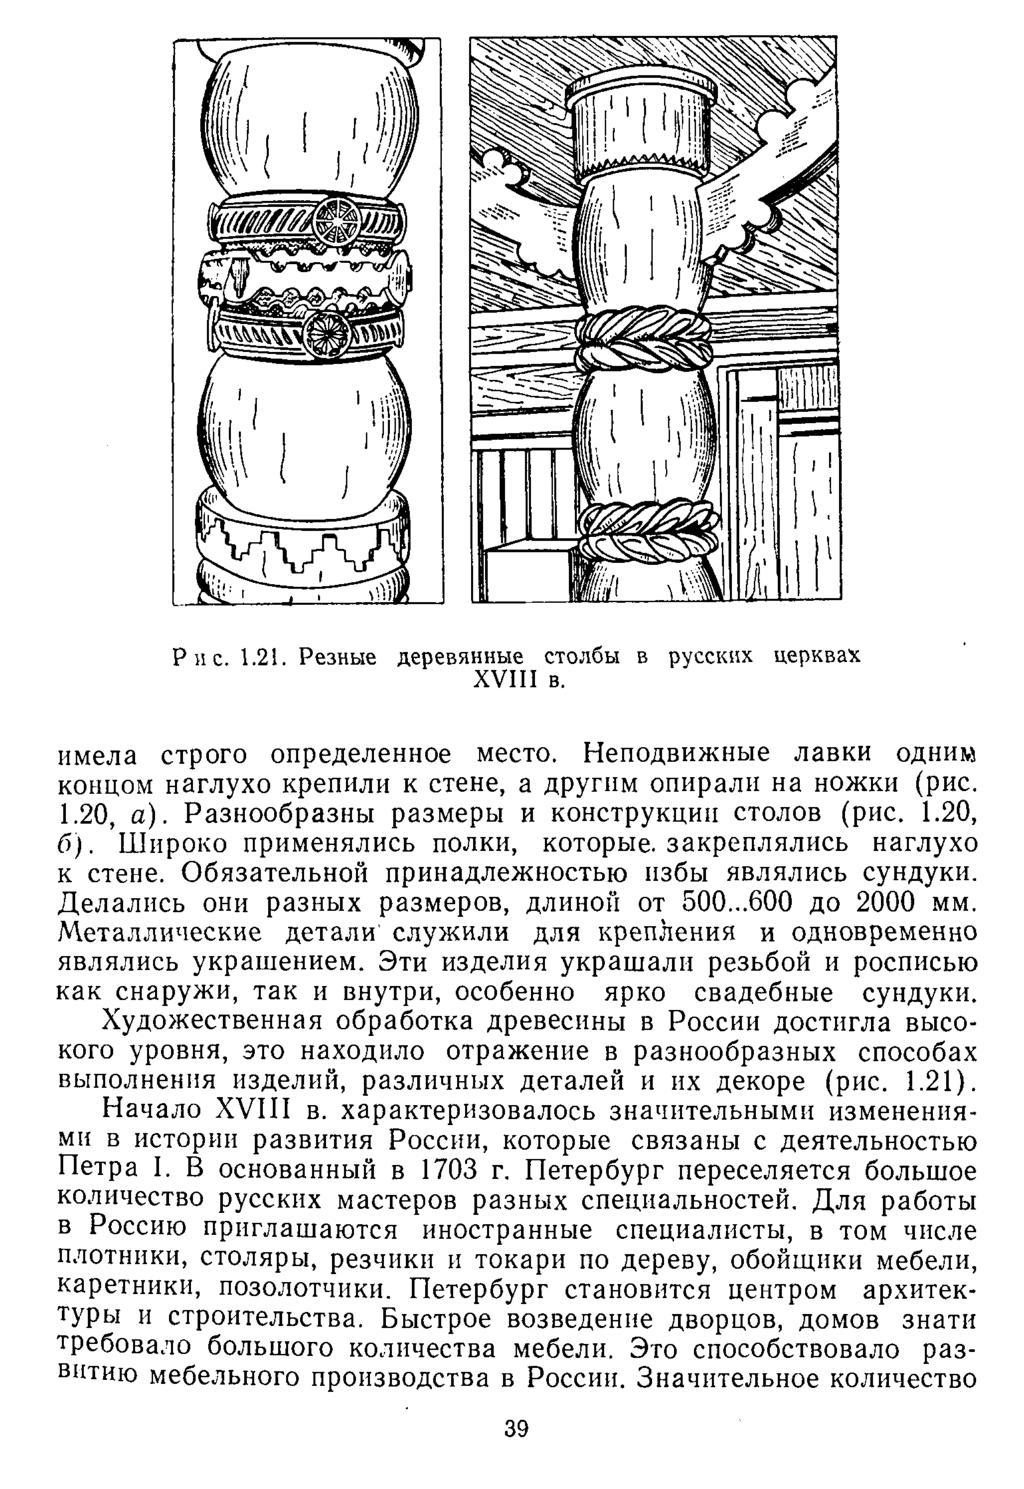 Скамейки из дерева, плюсы и минусы, классификация, эксплуатация, уход